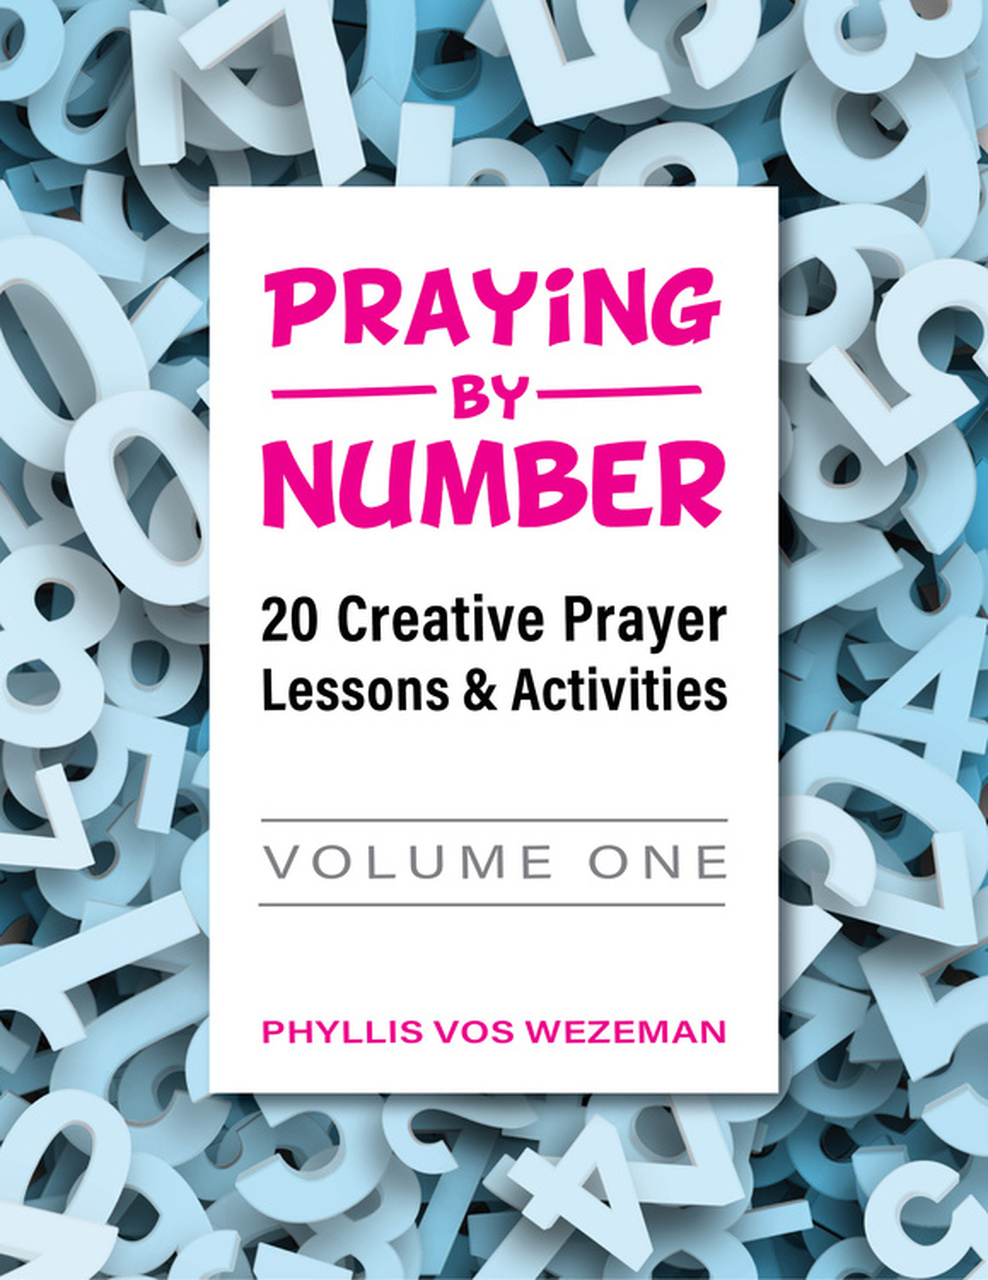 Iusb Spring 2020 Calendar.Praying By Number Volume 1 20 Creative Prayer Lessons Activities